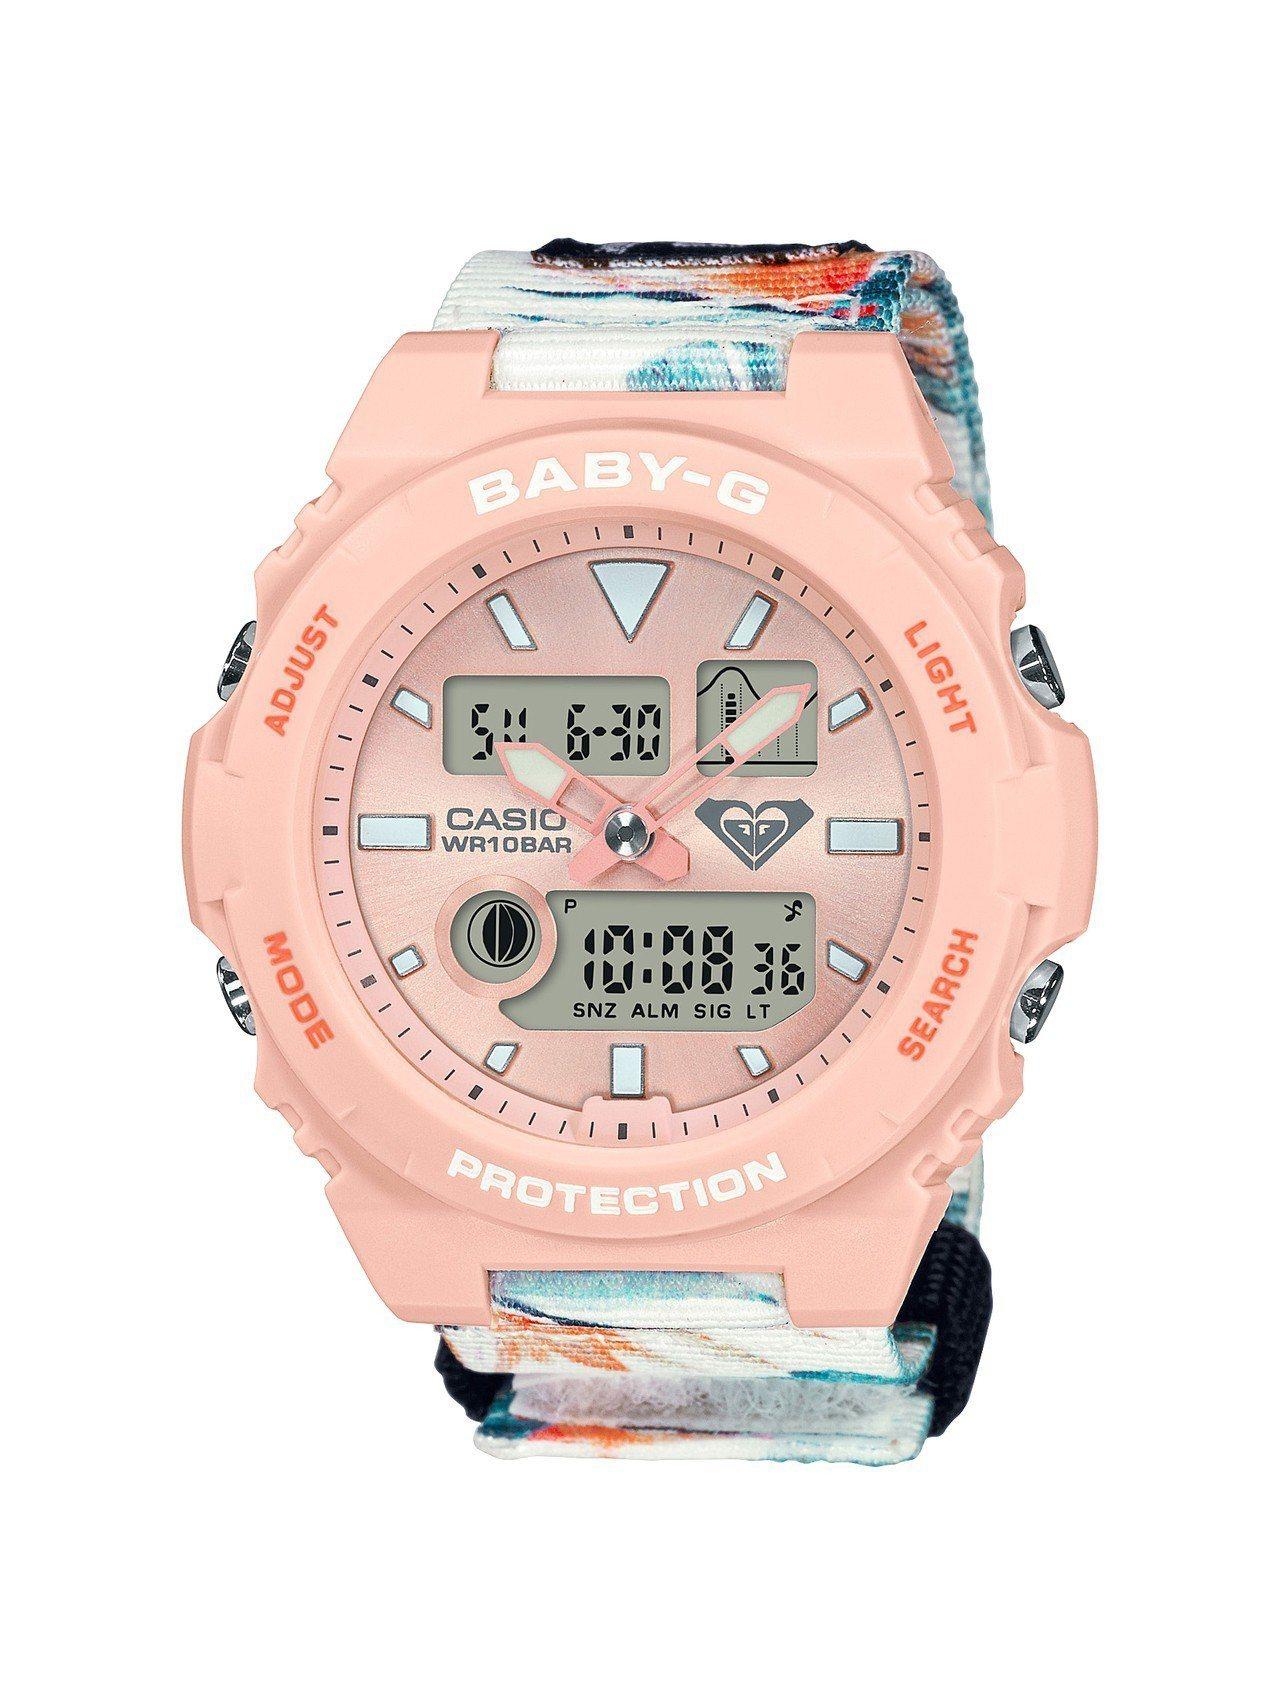 Baby-G BAX-100RX-4A表款,搭載潮汐功能與月相資訊,全台限量10...